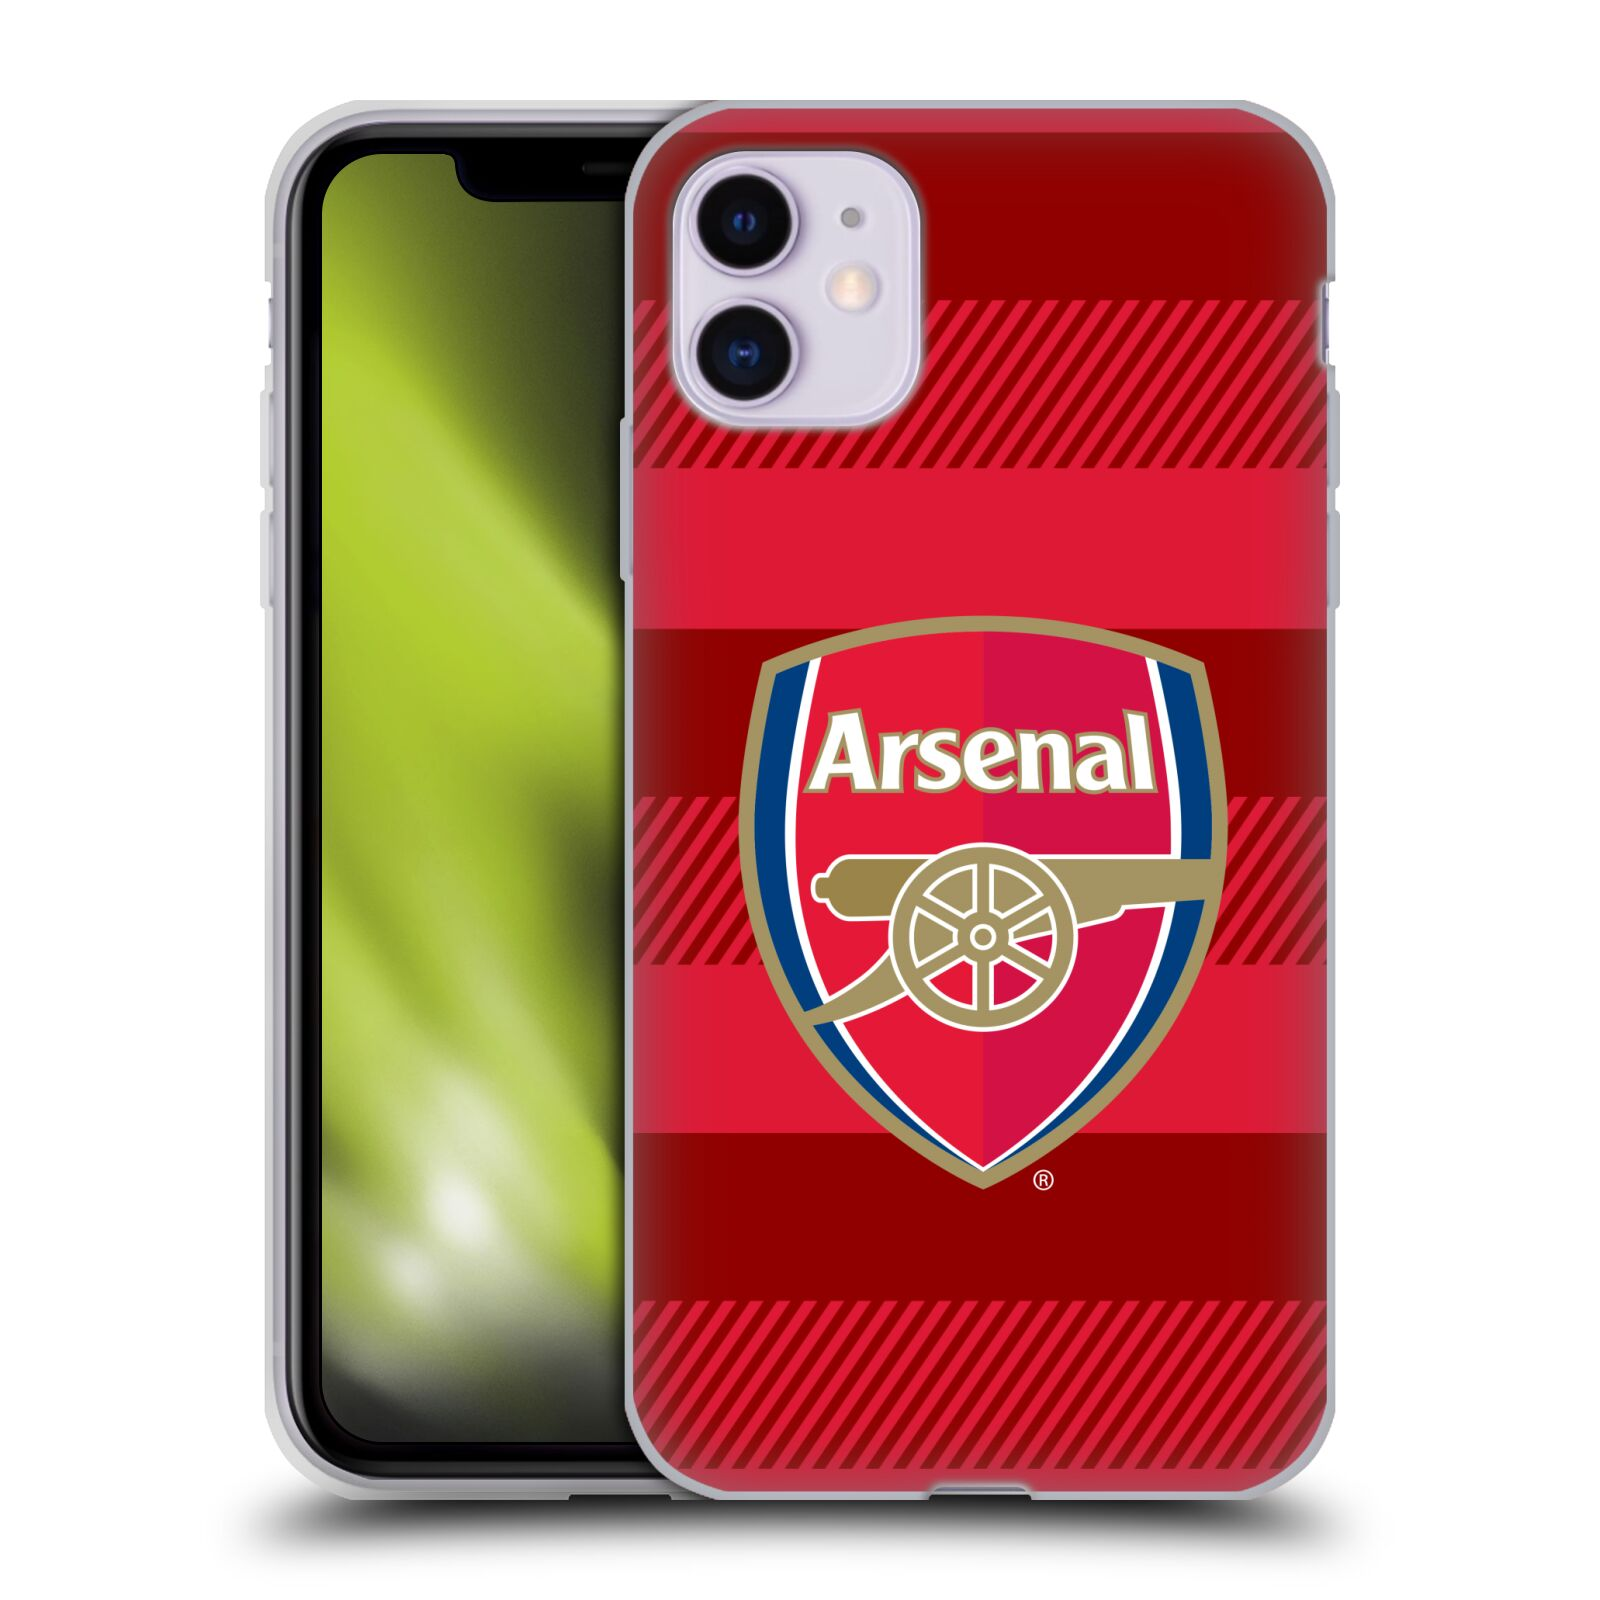 Silikonové pouzdro na mobil Apple iPhone 11 - Head Case - Arsenal FC - Logo s pruhy